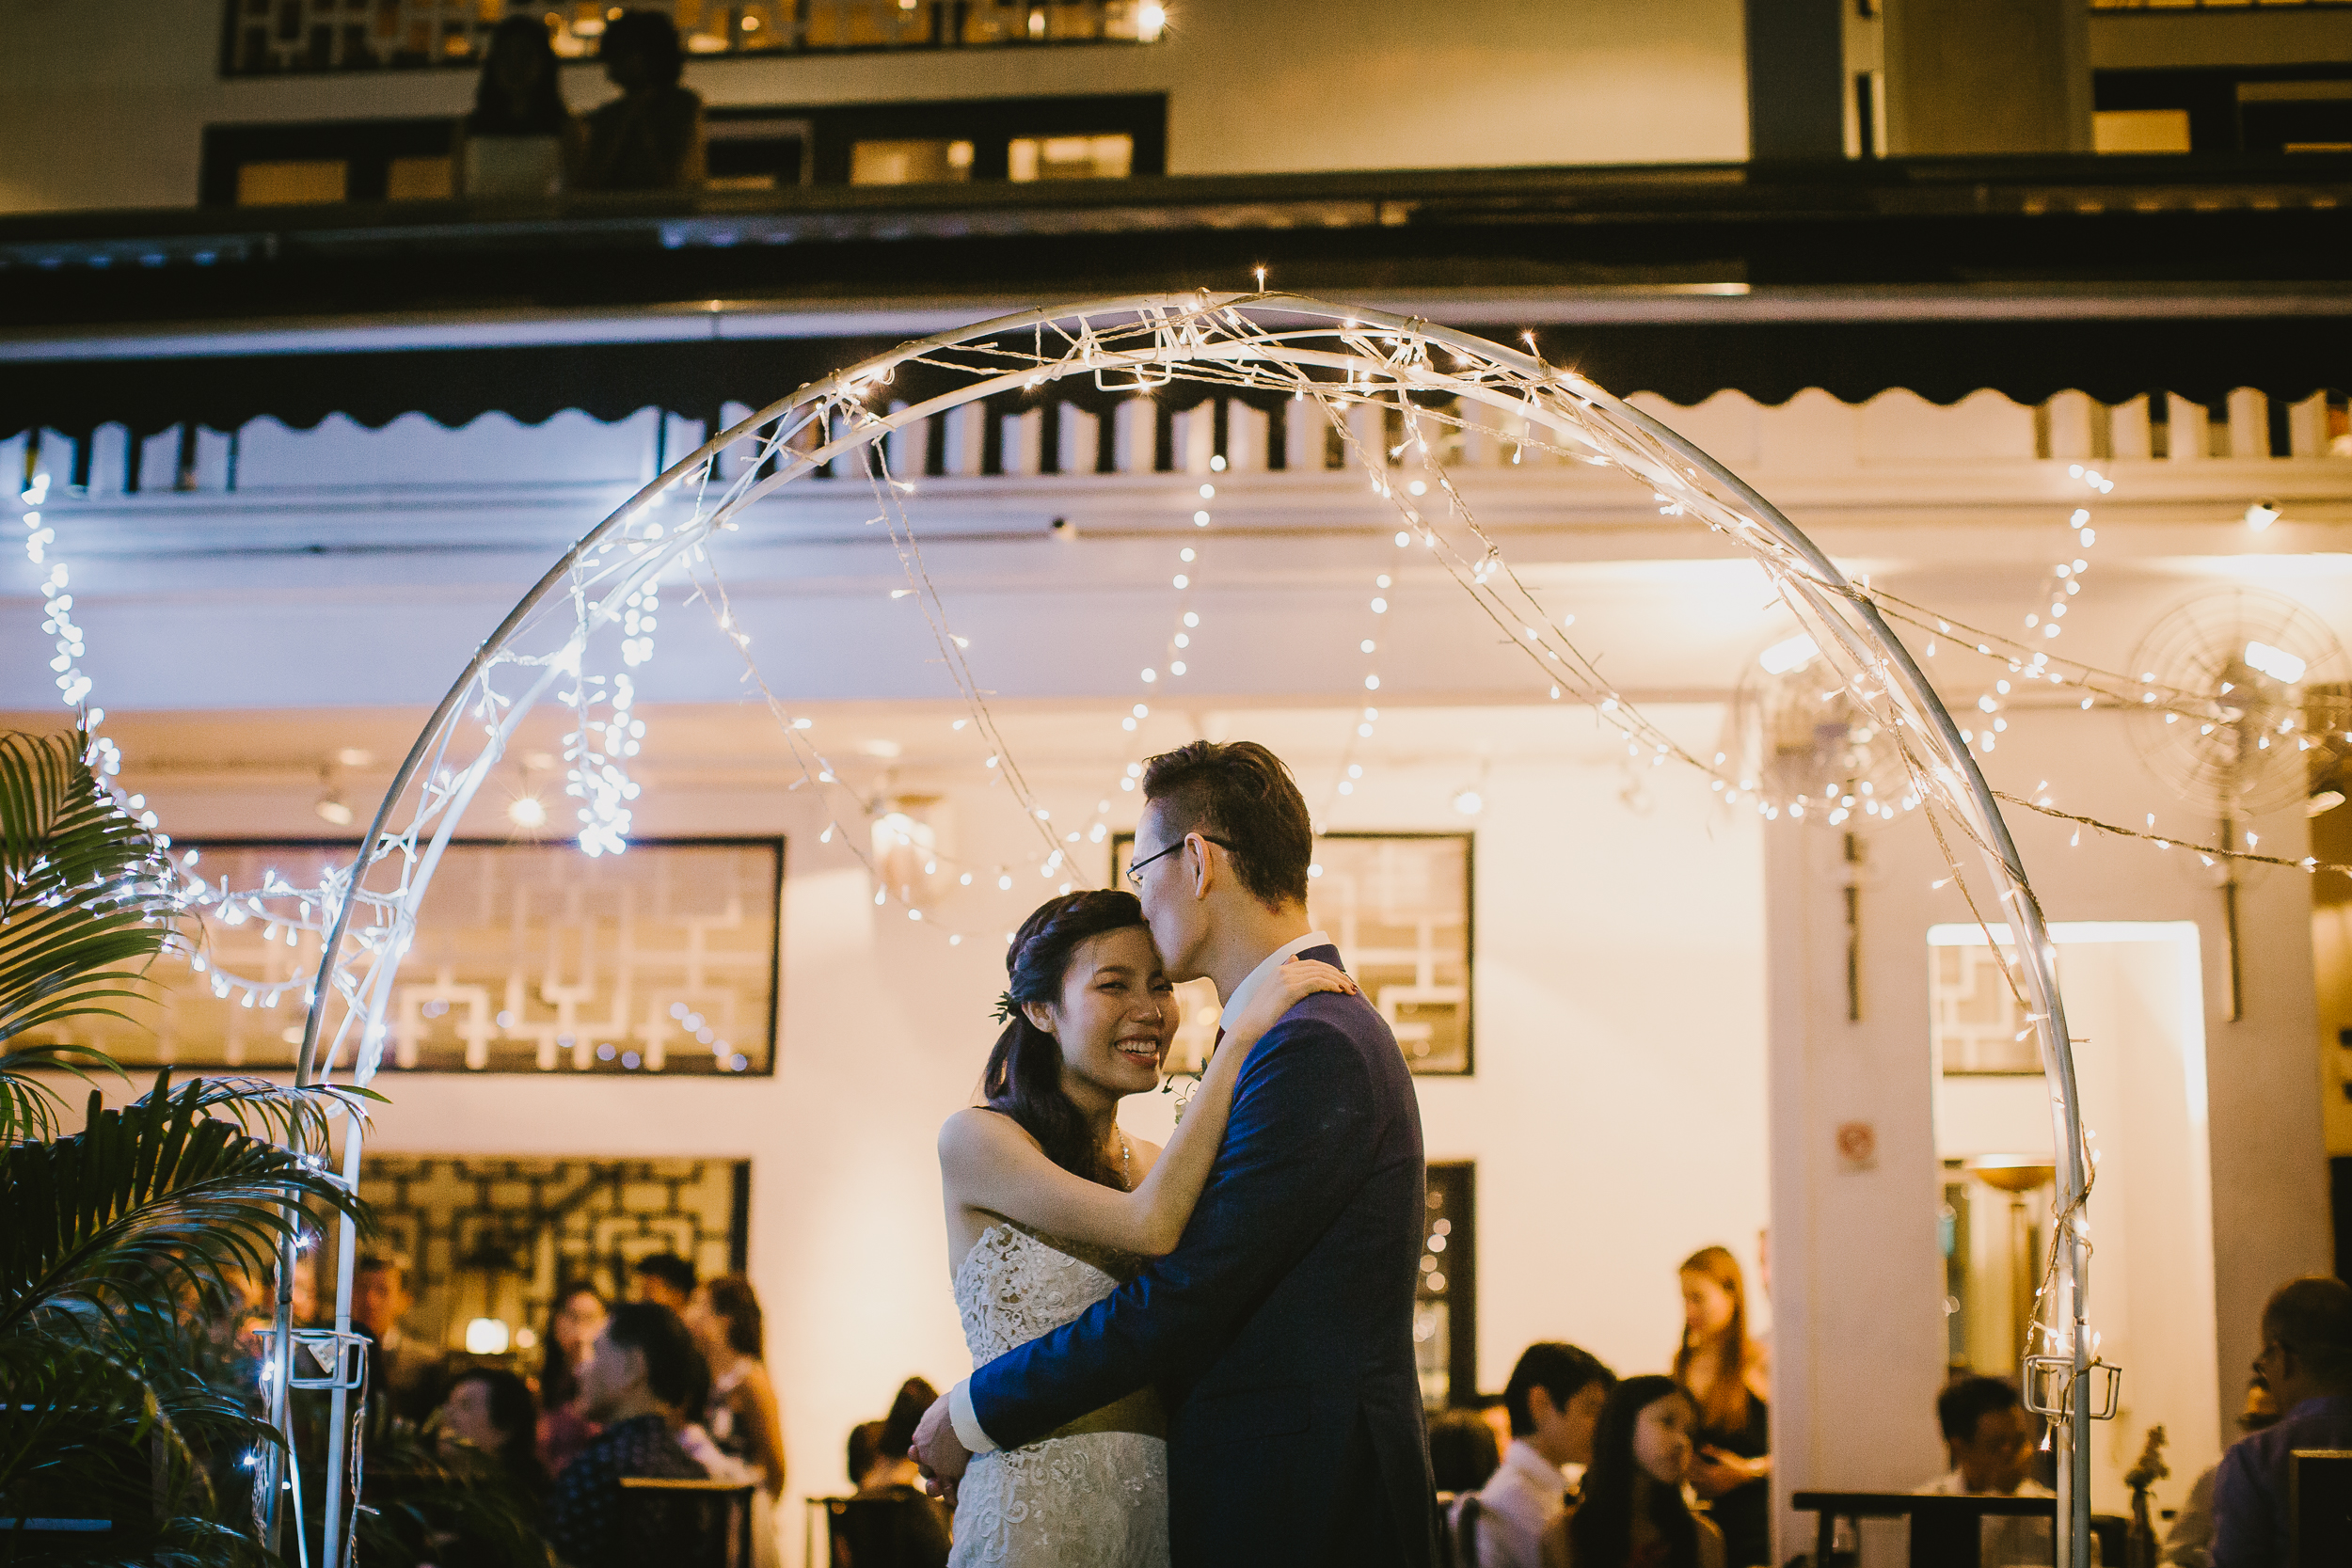 Singapore+Actual+Day+Wedding+Photographer+Min+Jiang+Rochester+Gareth+Faith--0079.jpg